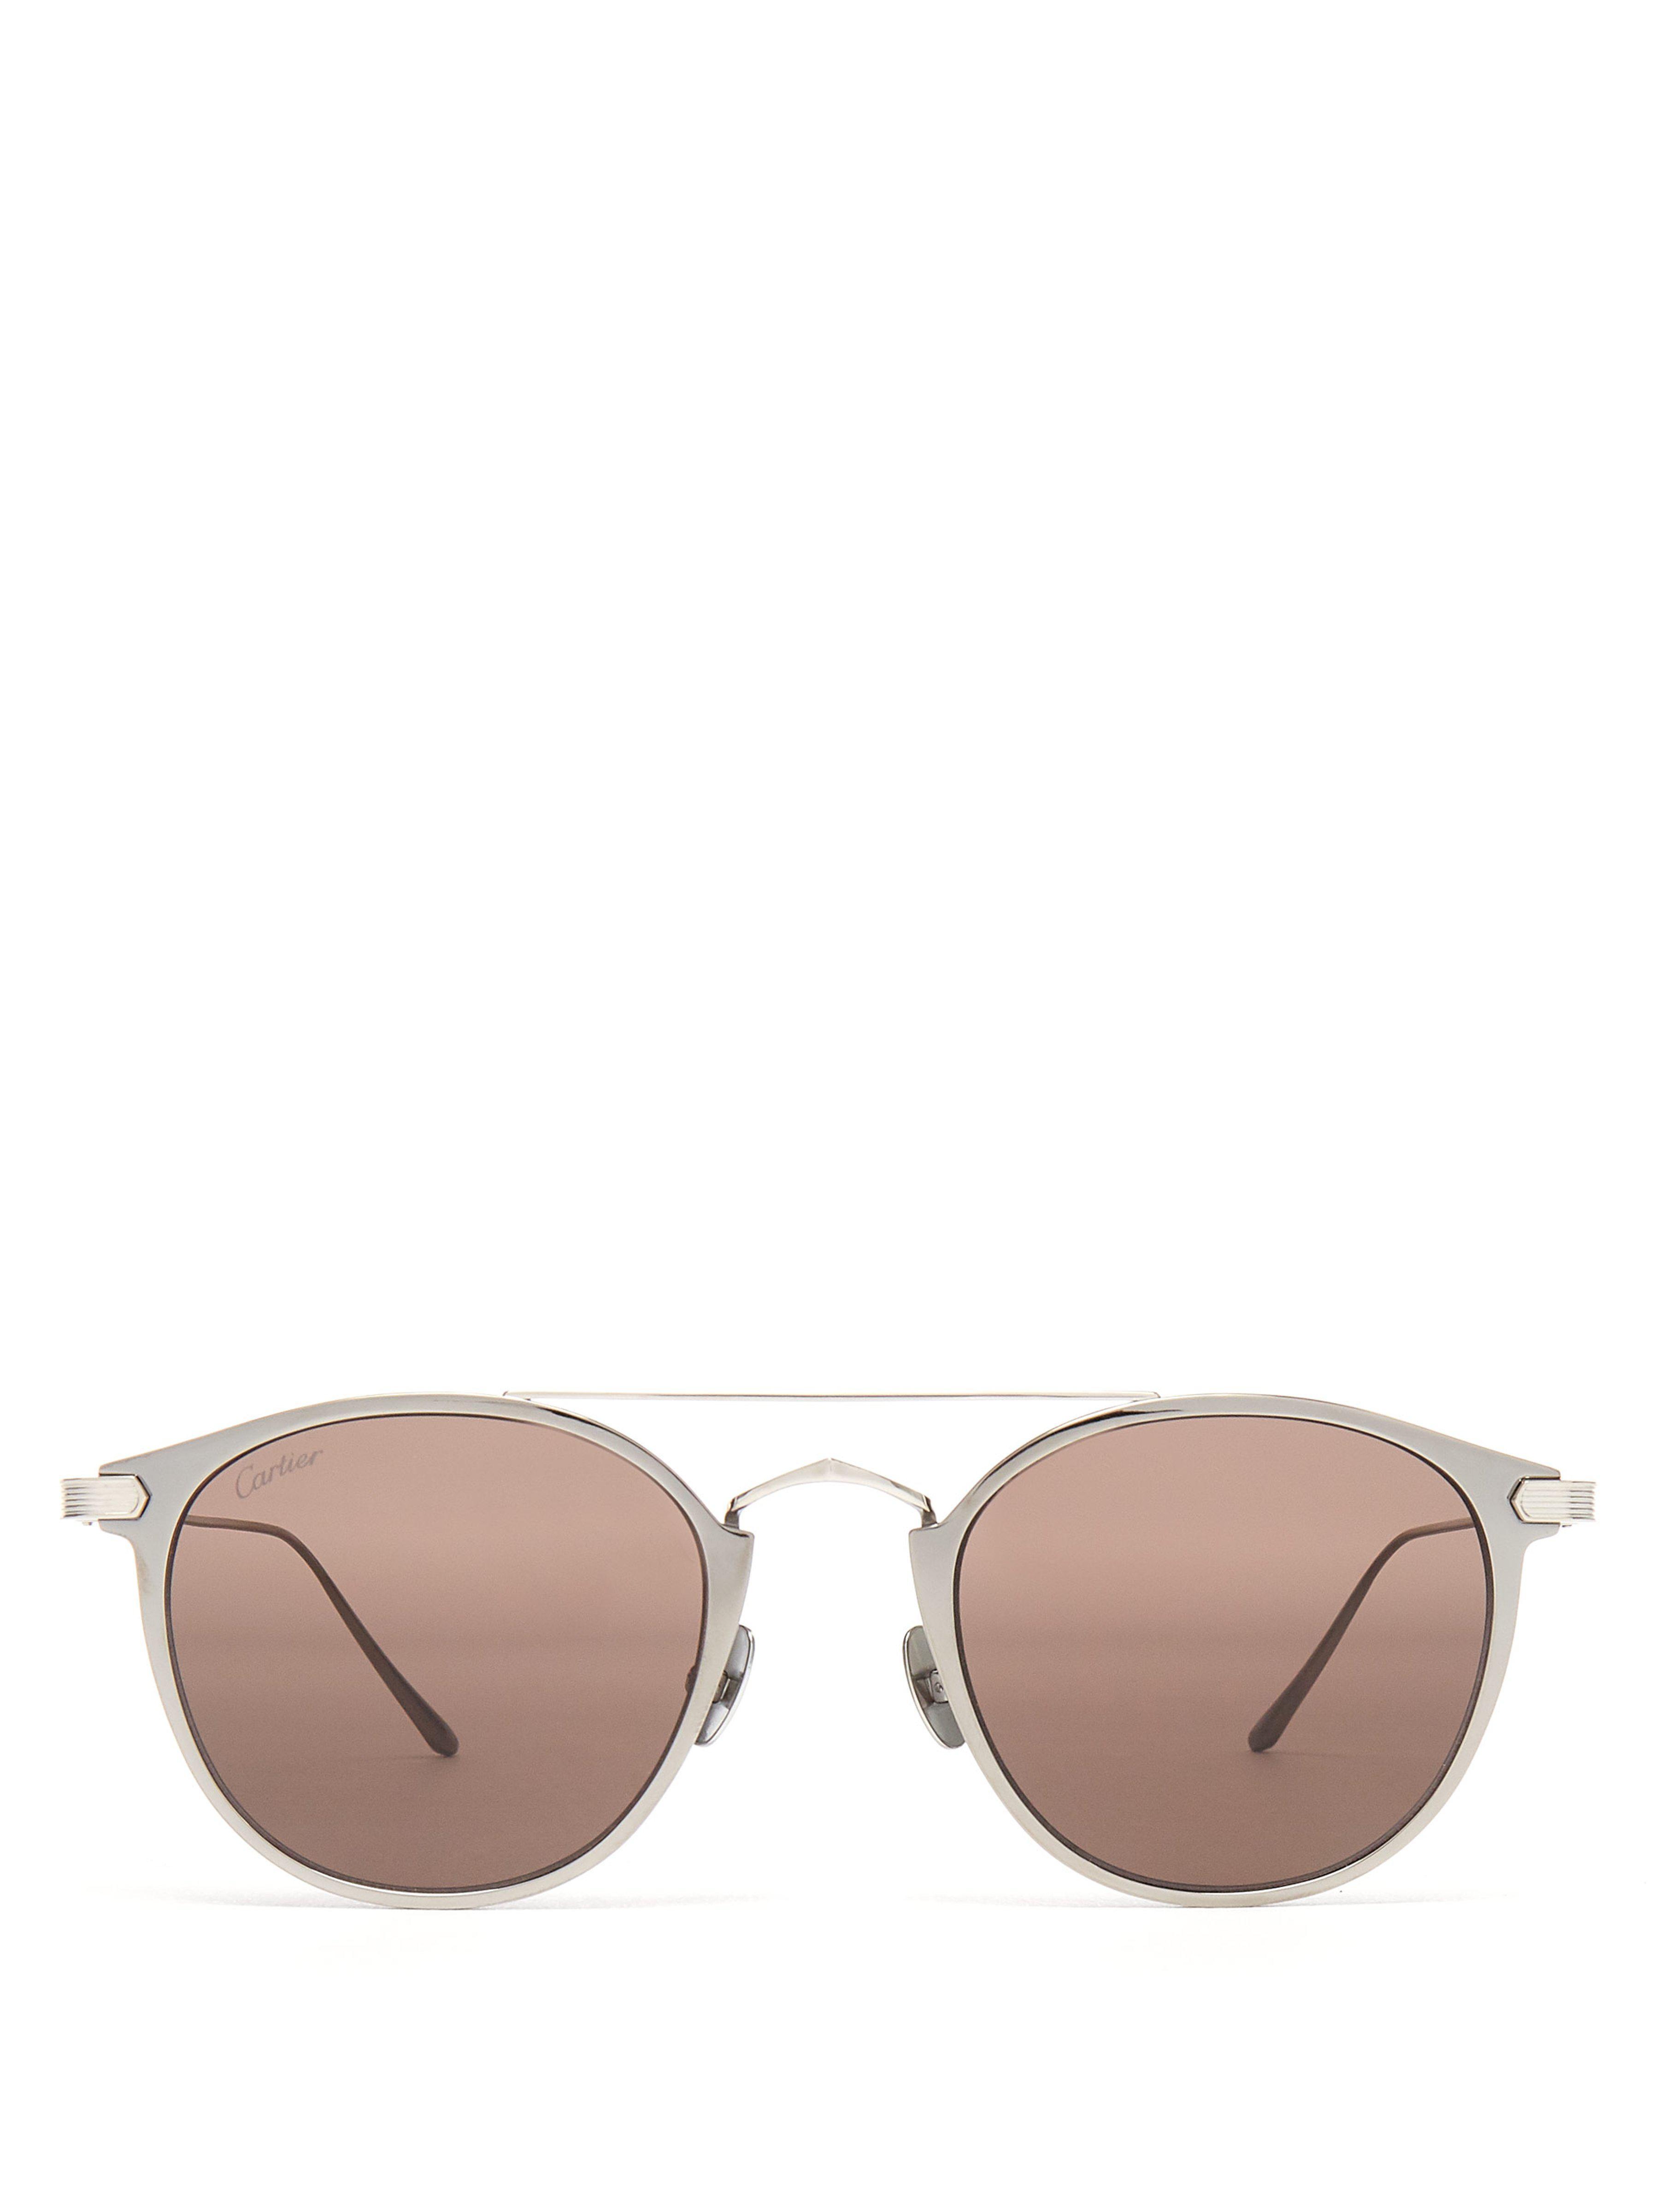 05643cc7d31 Cartier - Multicolor Round Frame Metal Sunglasses for Men - Lyst. View  fullscreen